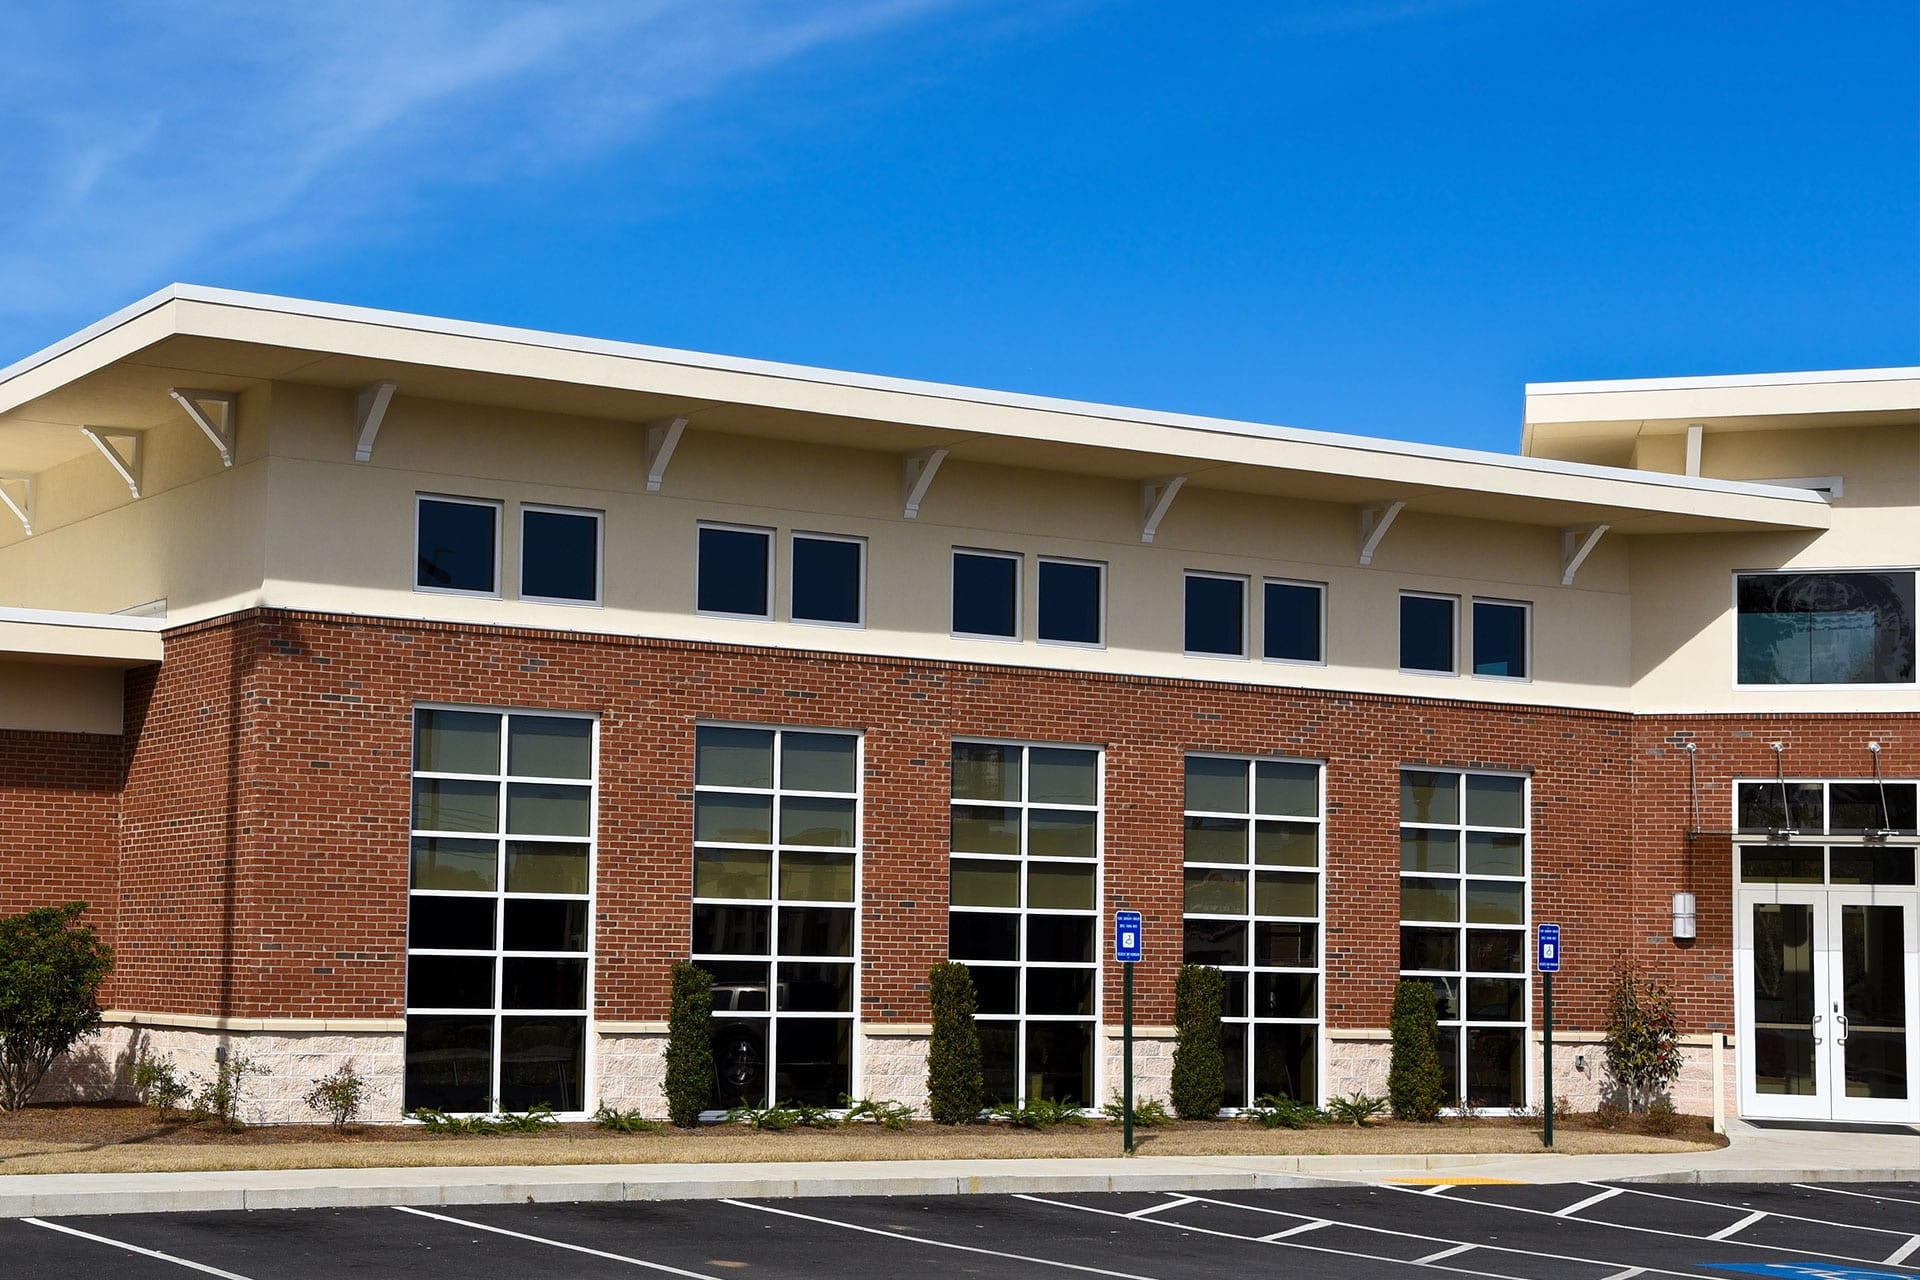 Commercial Buildings | Paint Maintenance | Arizona Painting Company